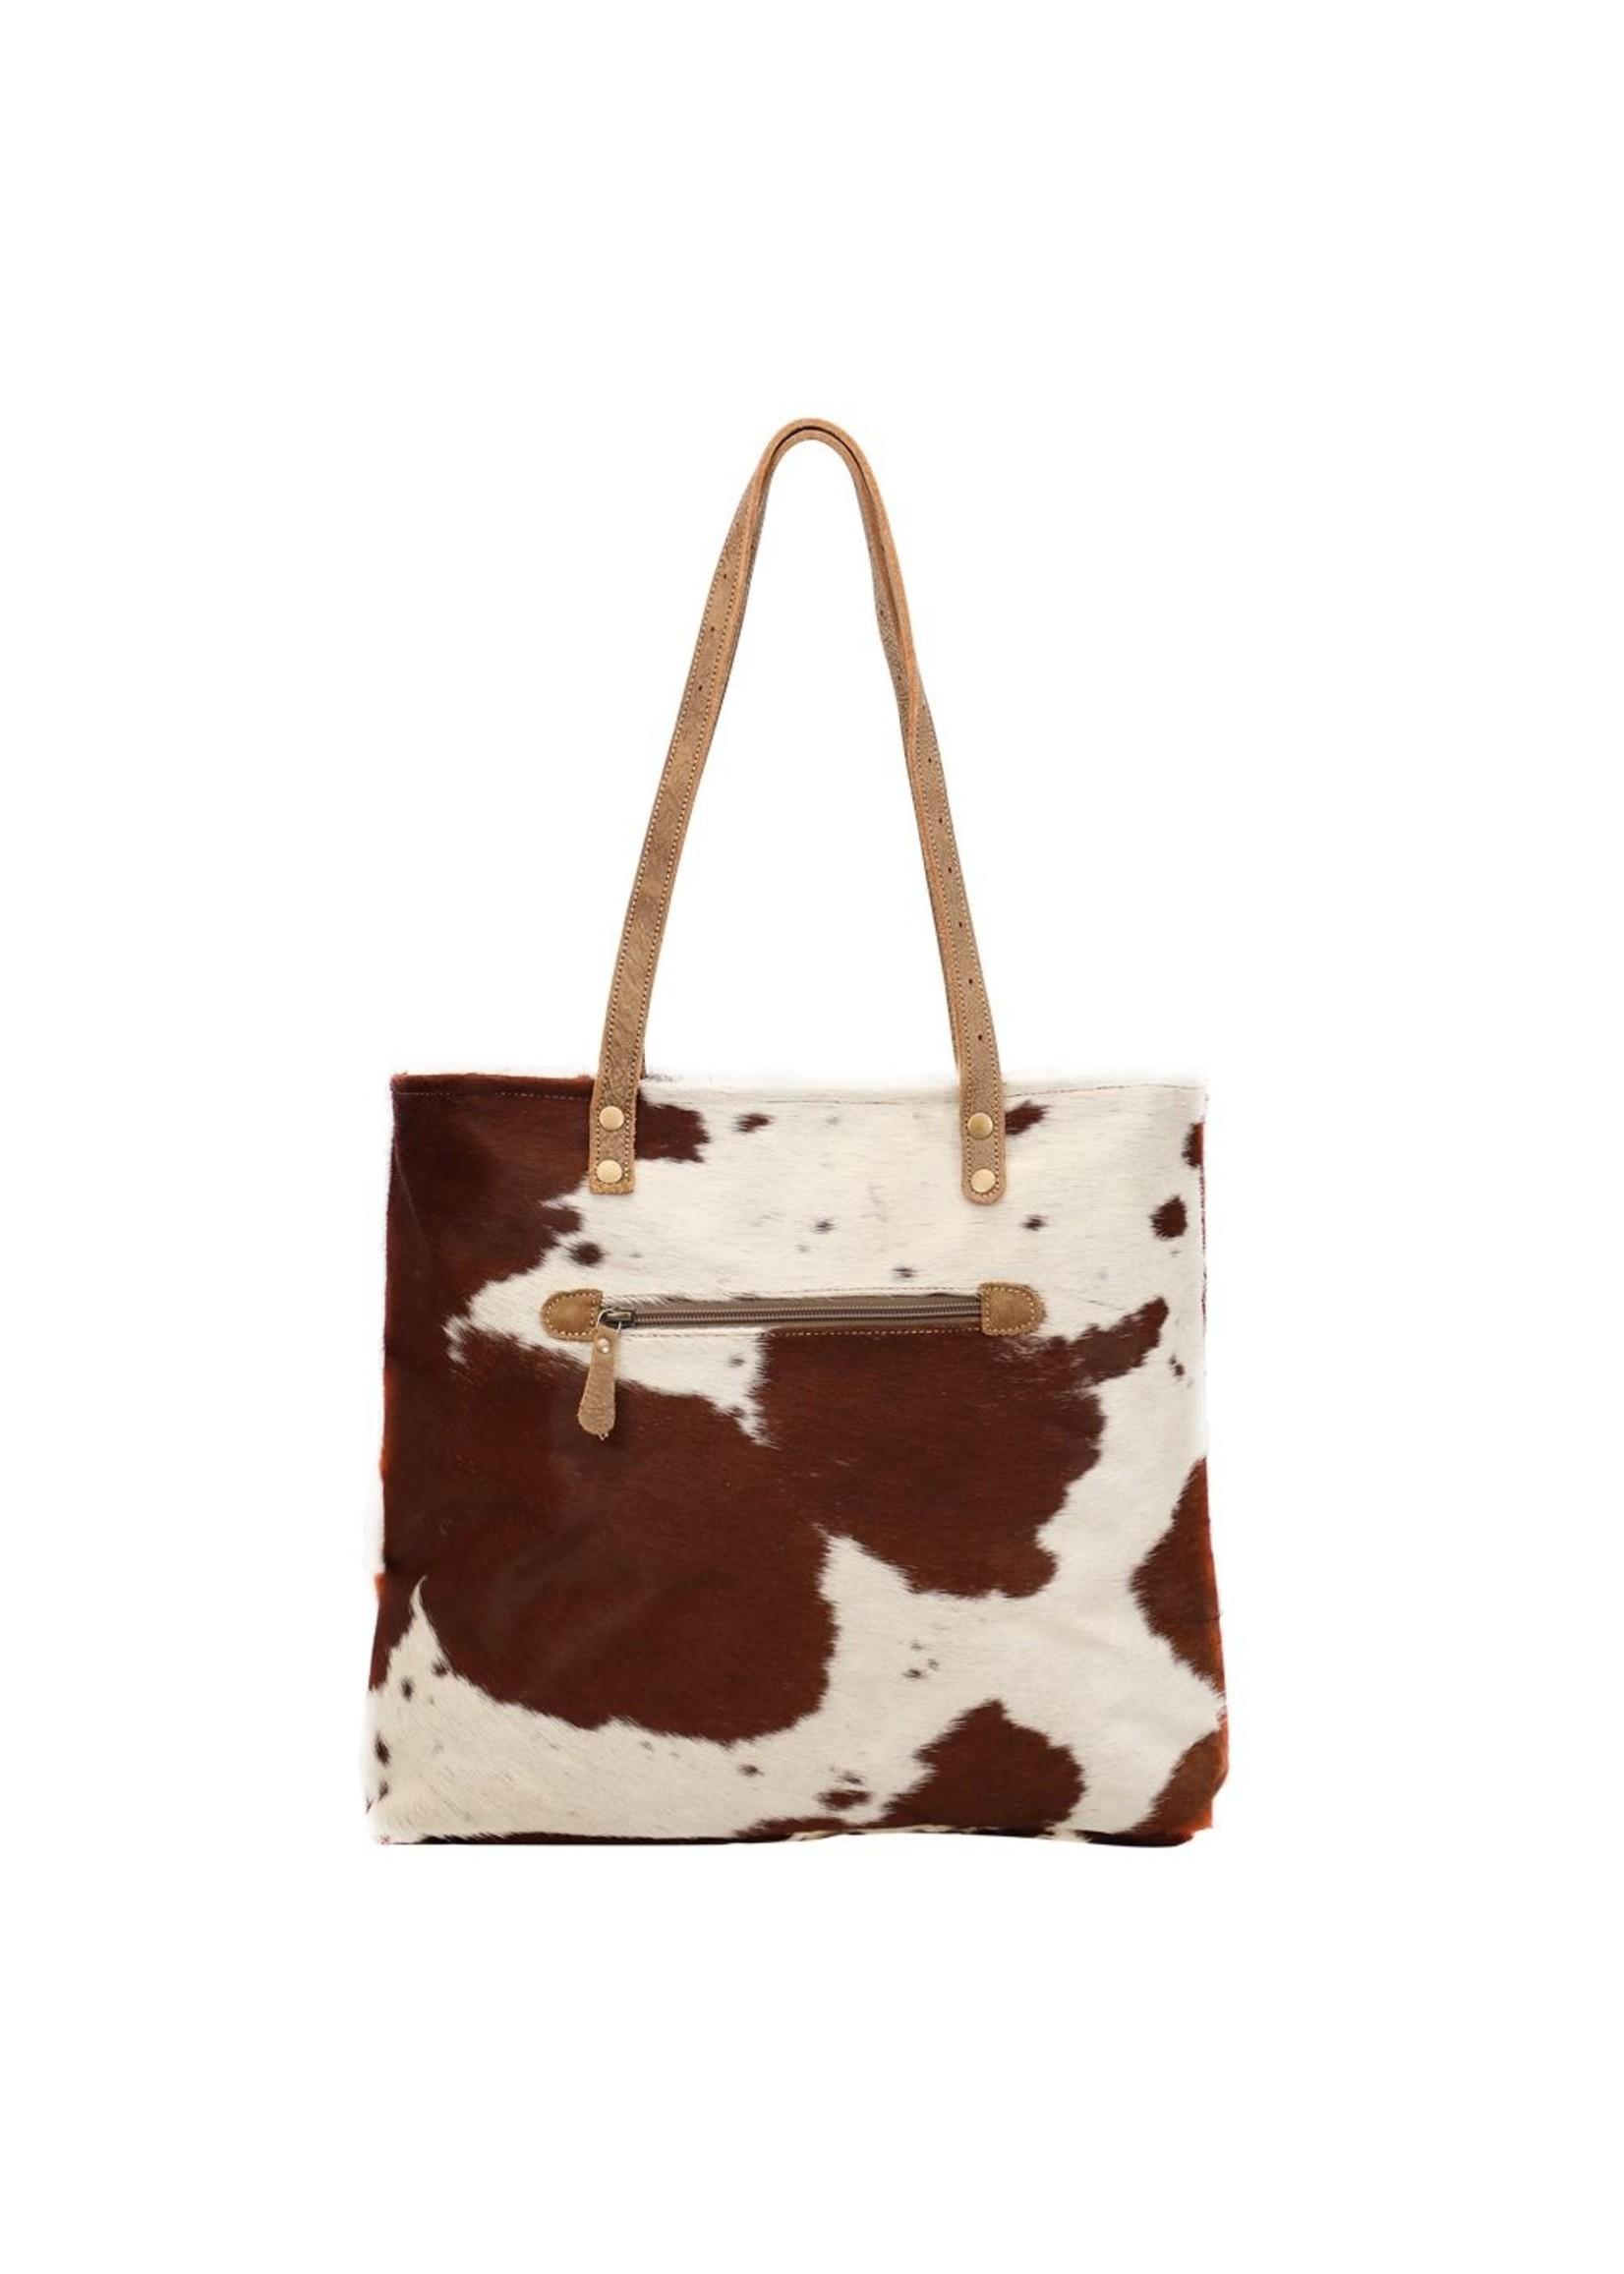 myra bags Caramel Front Pocket Hairon Tote Bag